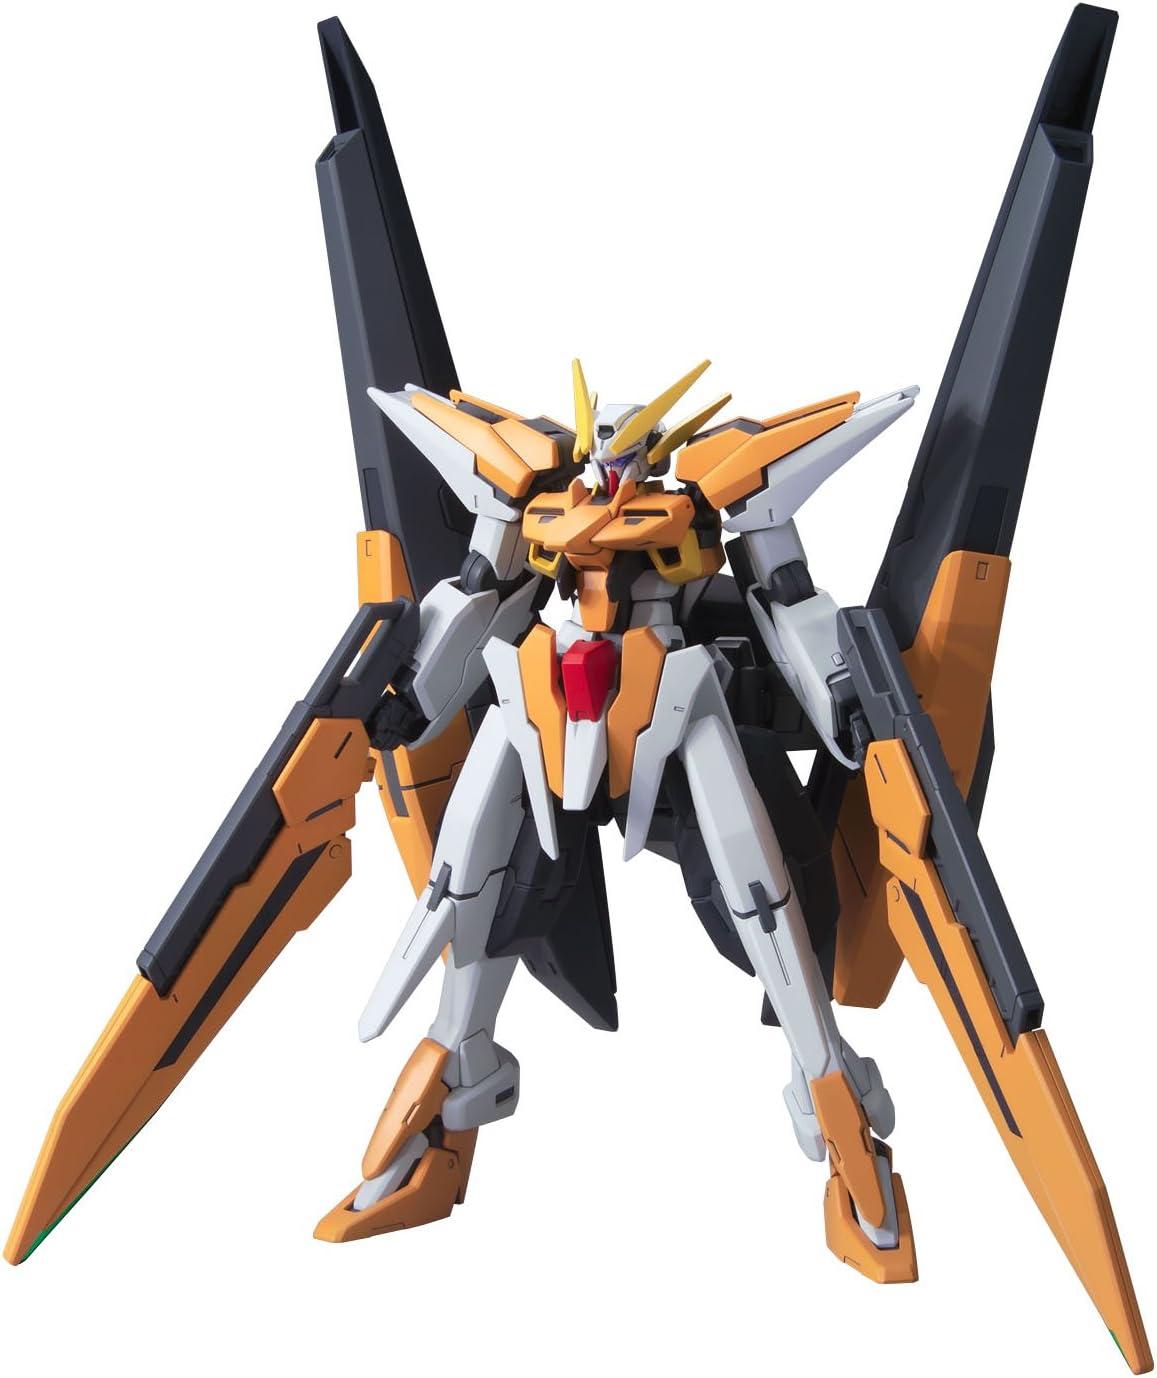 Gundam 00 Awakening of The trailblezer Soldering - Sca 144 1 Super-cheap Harute